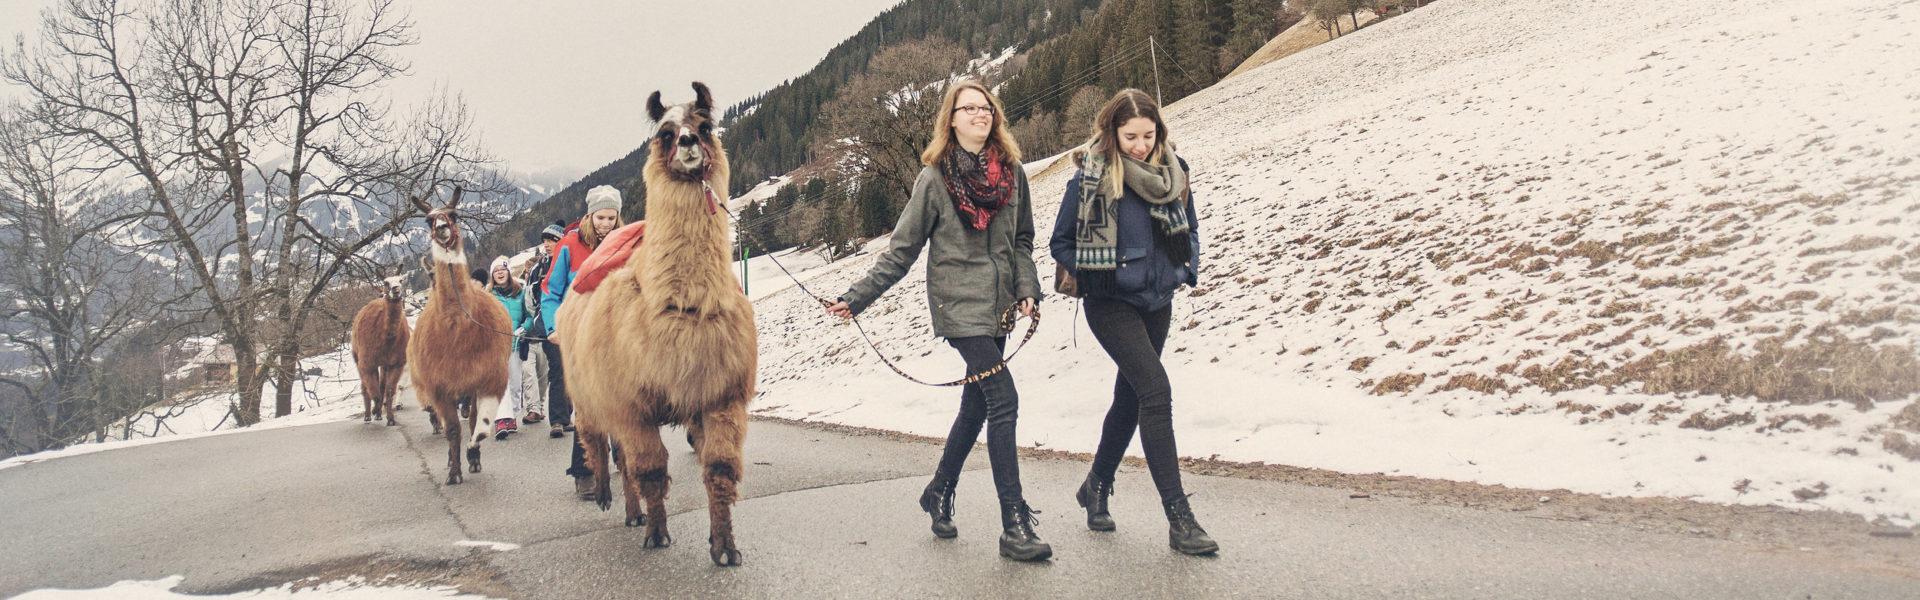 Lama Trekking, Bartholomäberg/Silbertal © Markus Gmeiner / Vorarlberg Tourismus GmbH